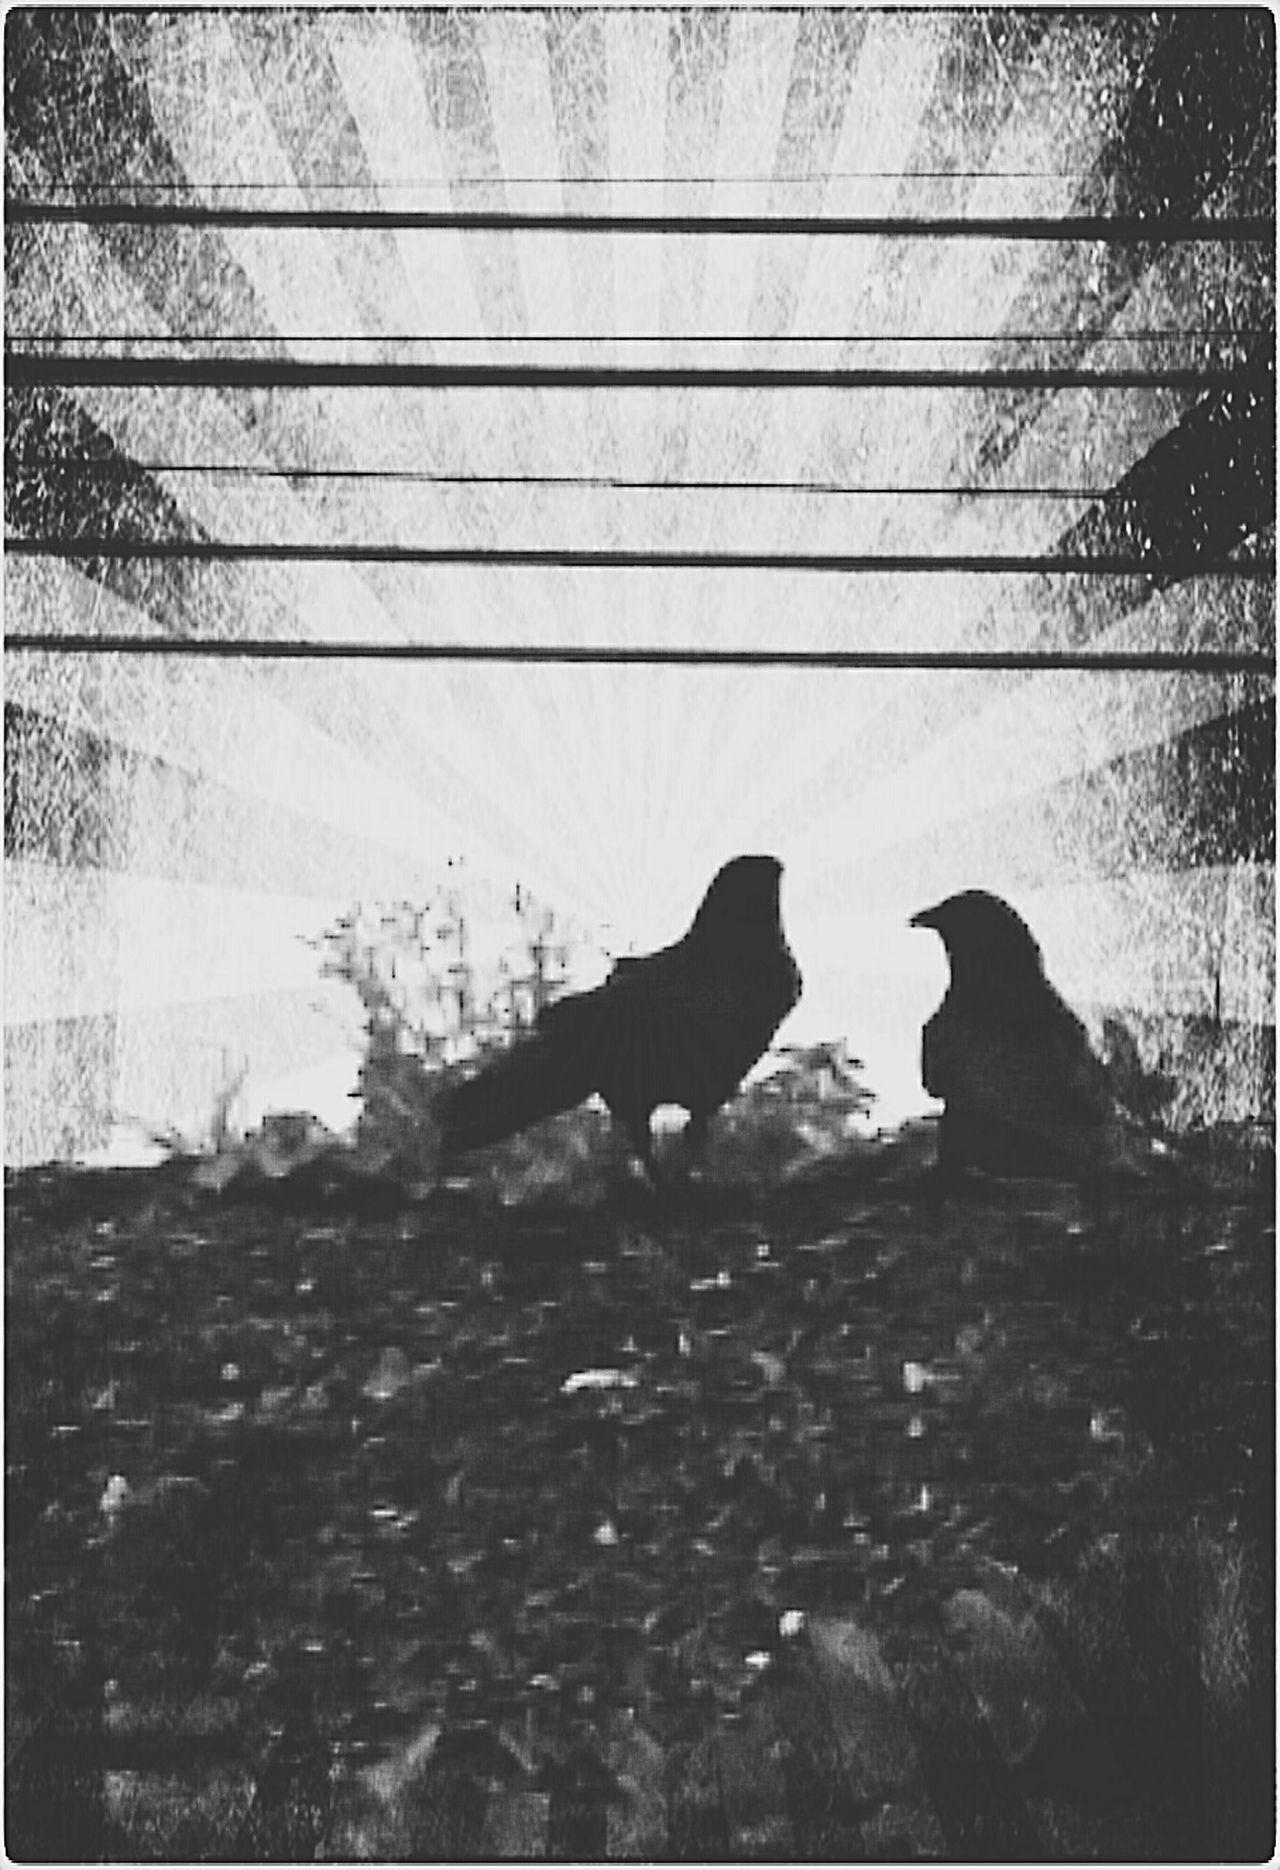 New Damn Dark Day Crows Black & White No Edit No Fun Black&white Black And White Blackandwhite